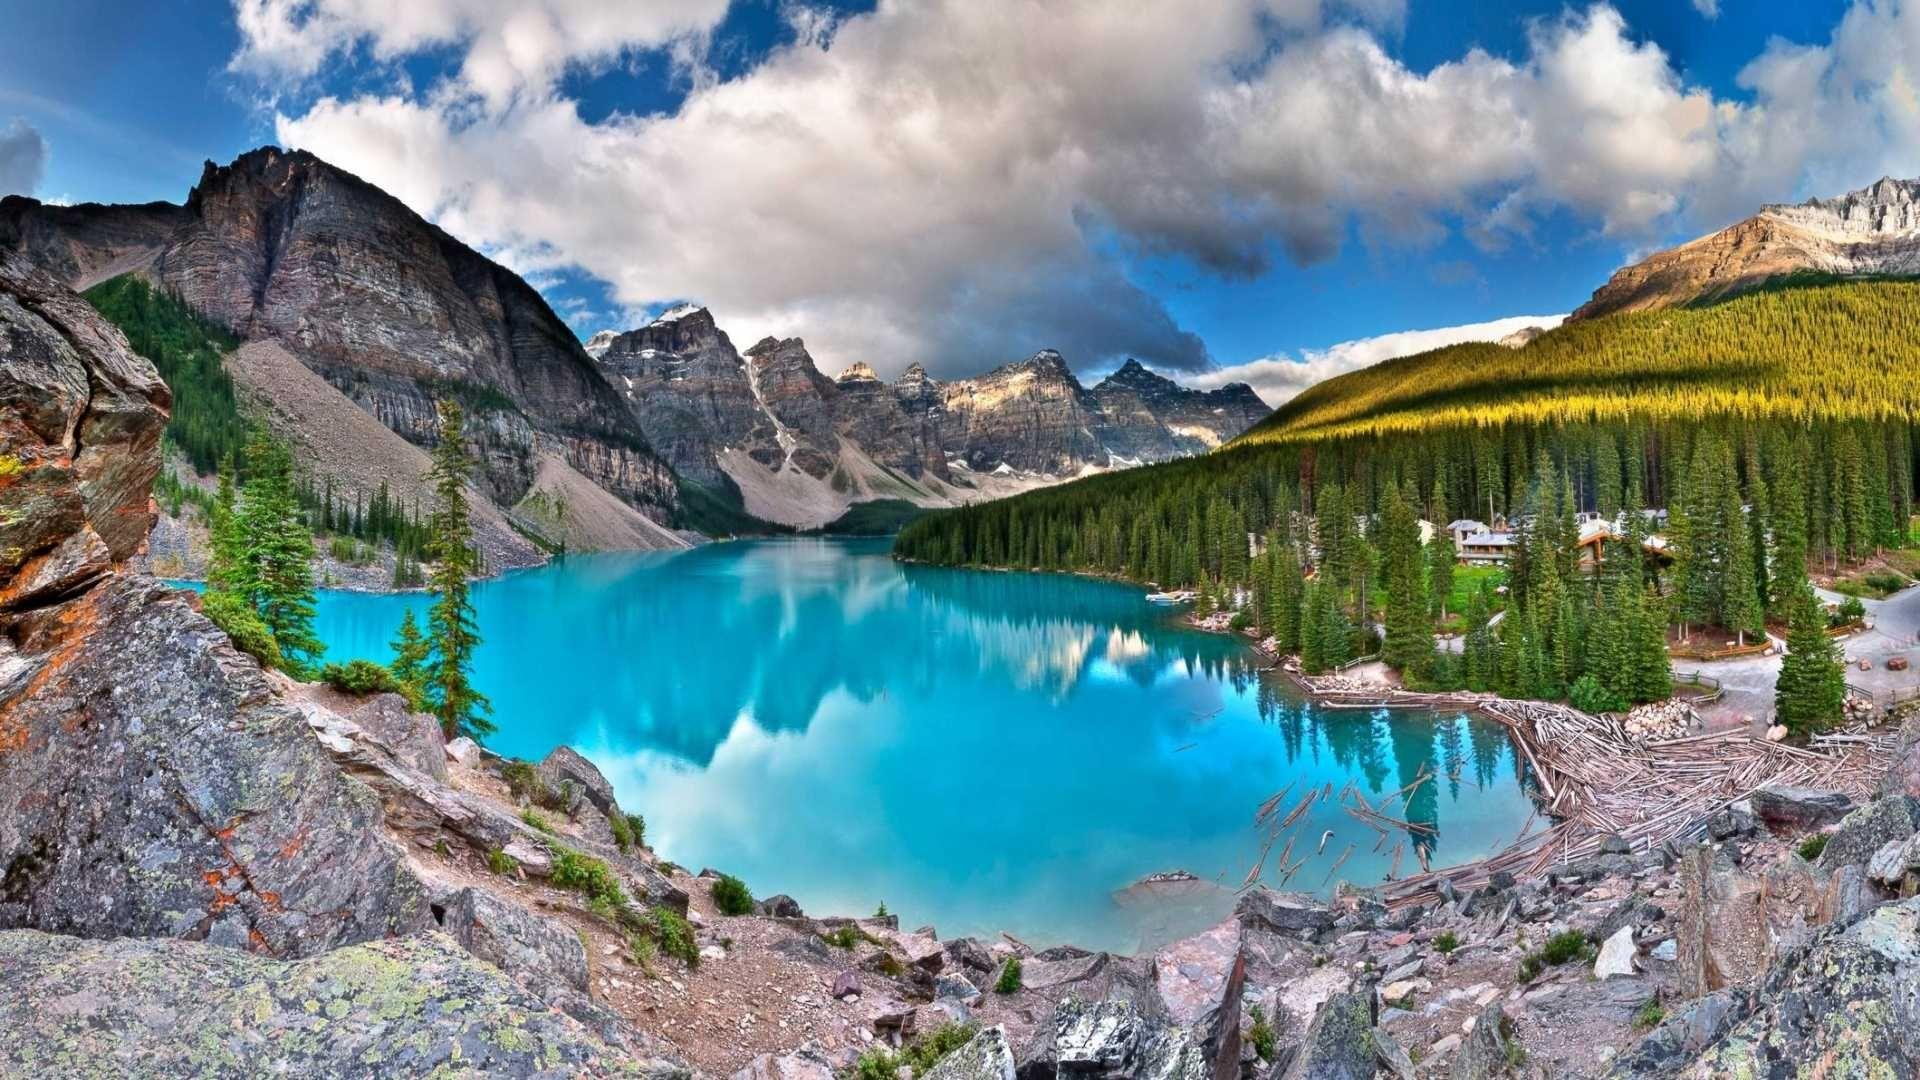 Glacial Moraine Lake